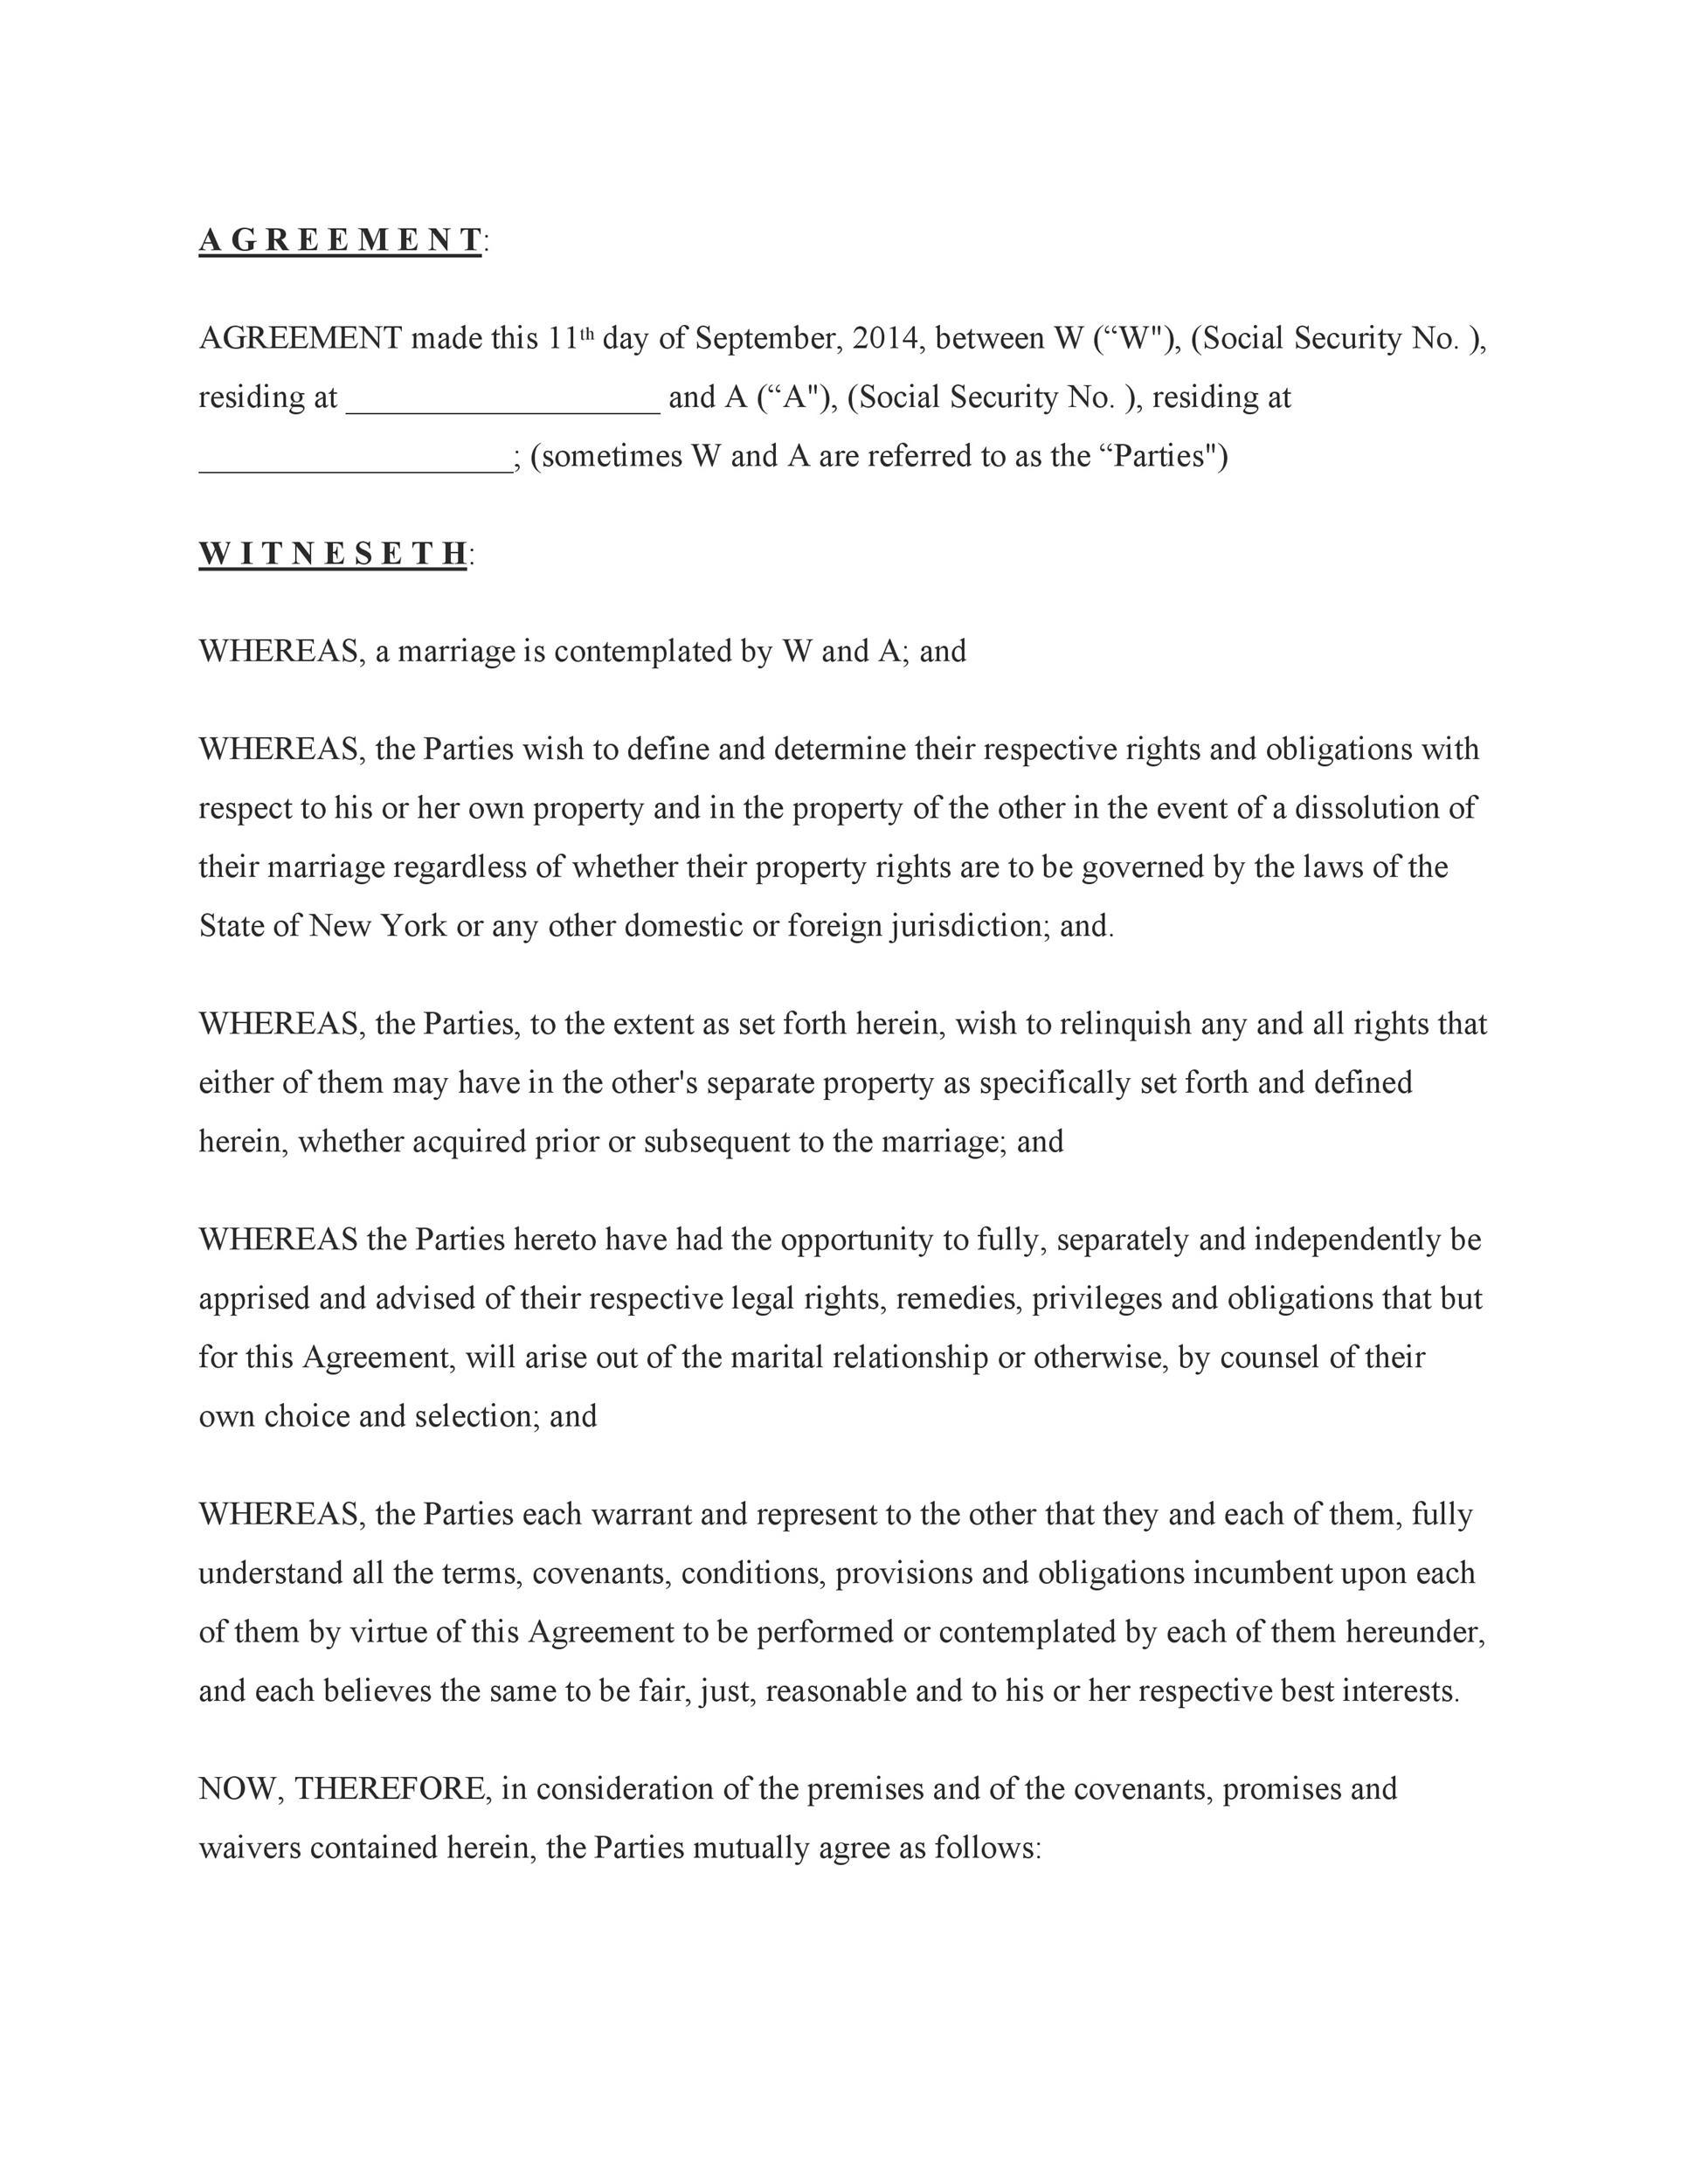 Free cohabitation agreement template 17